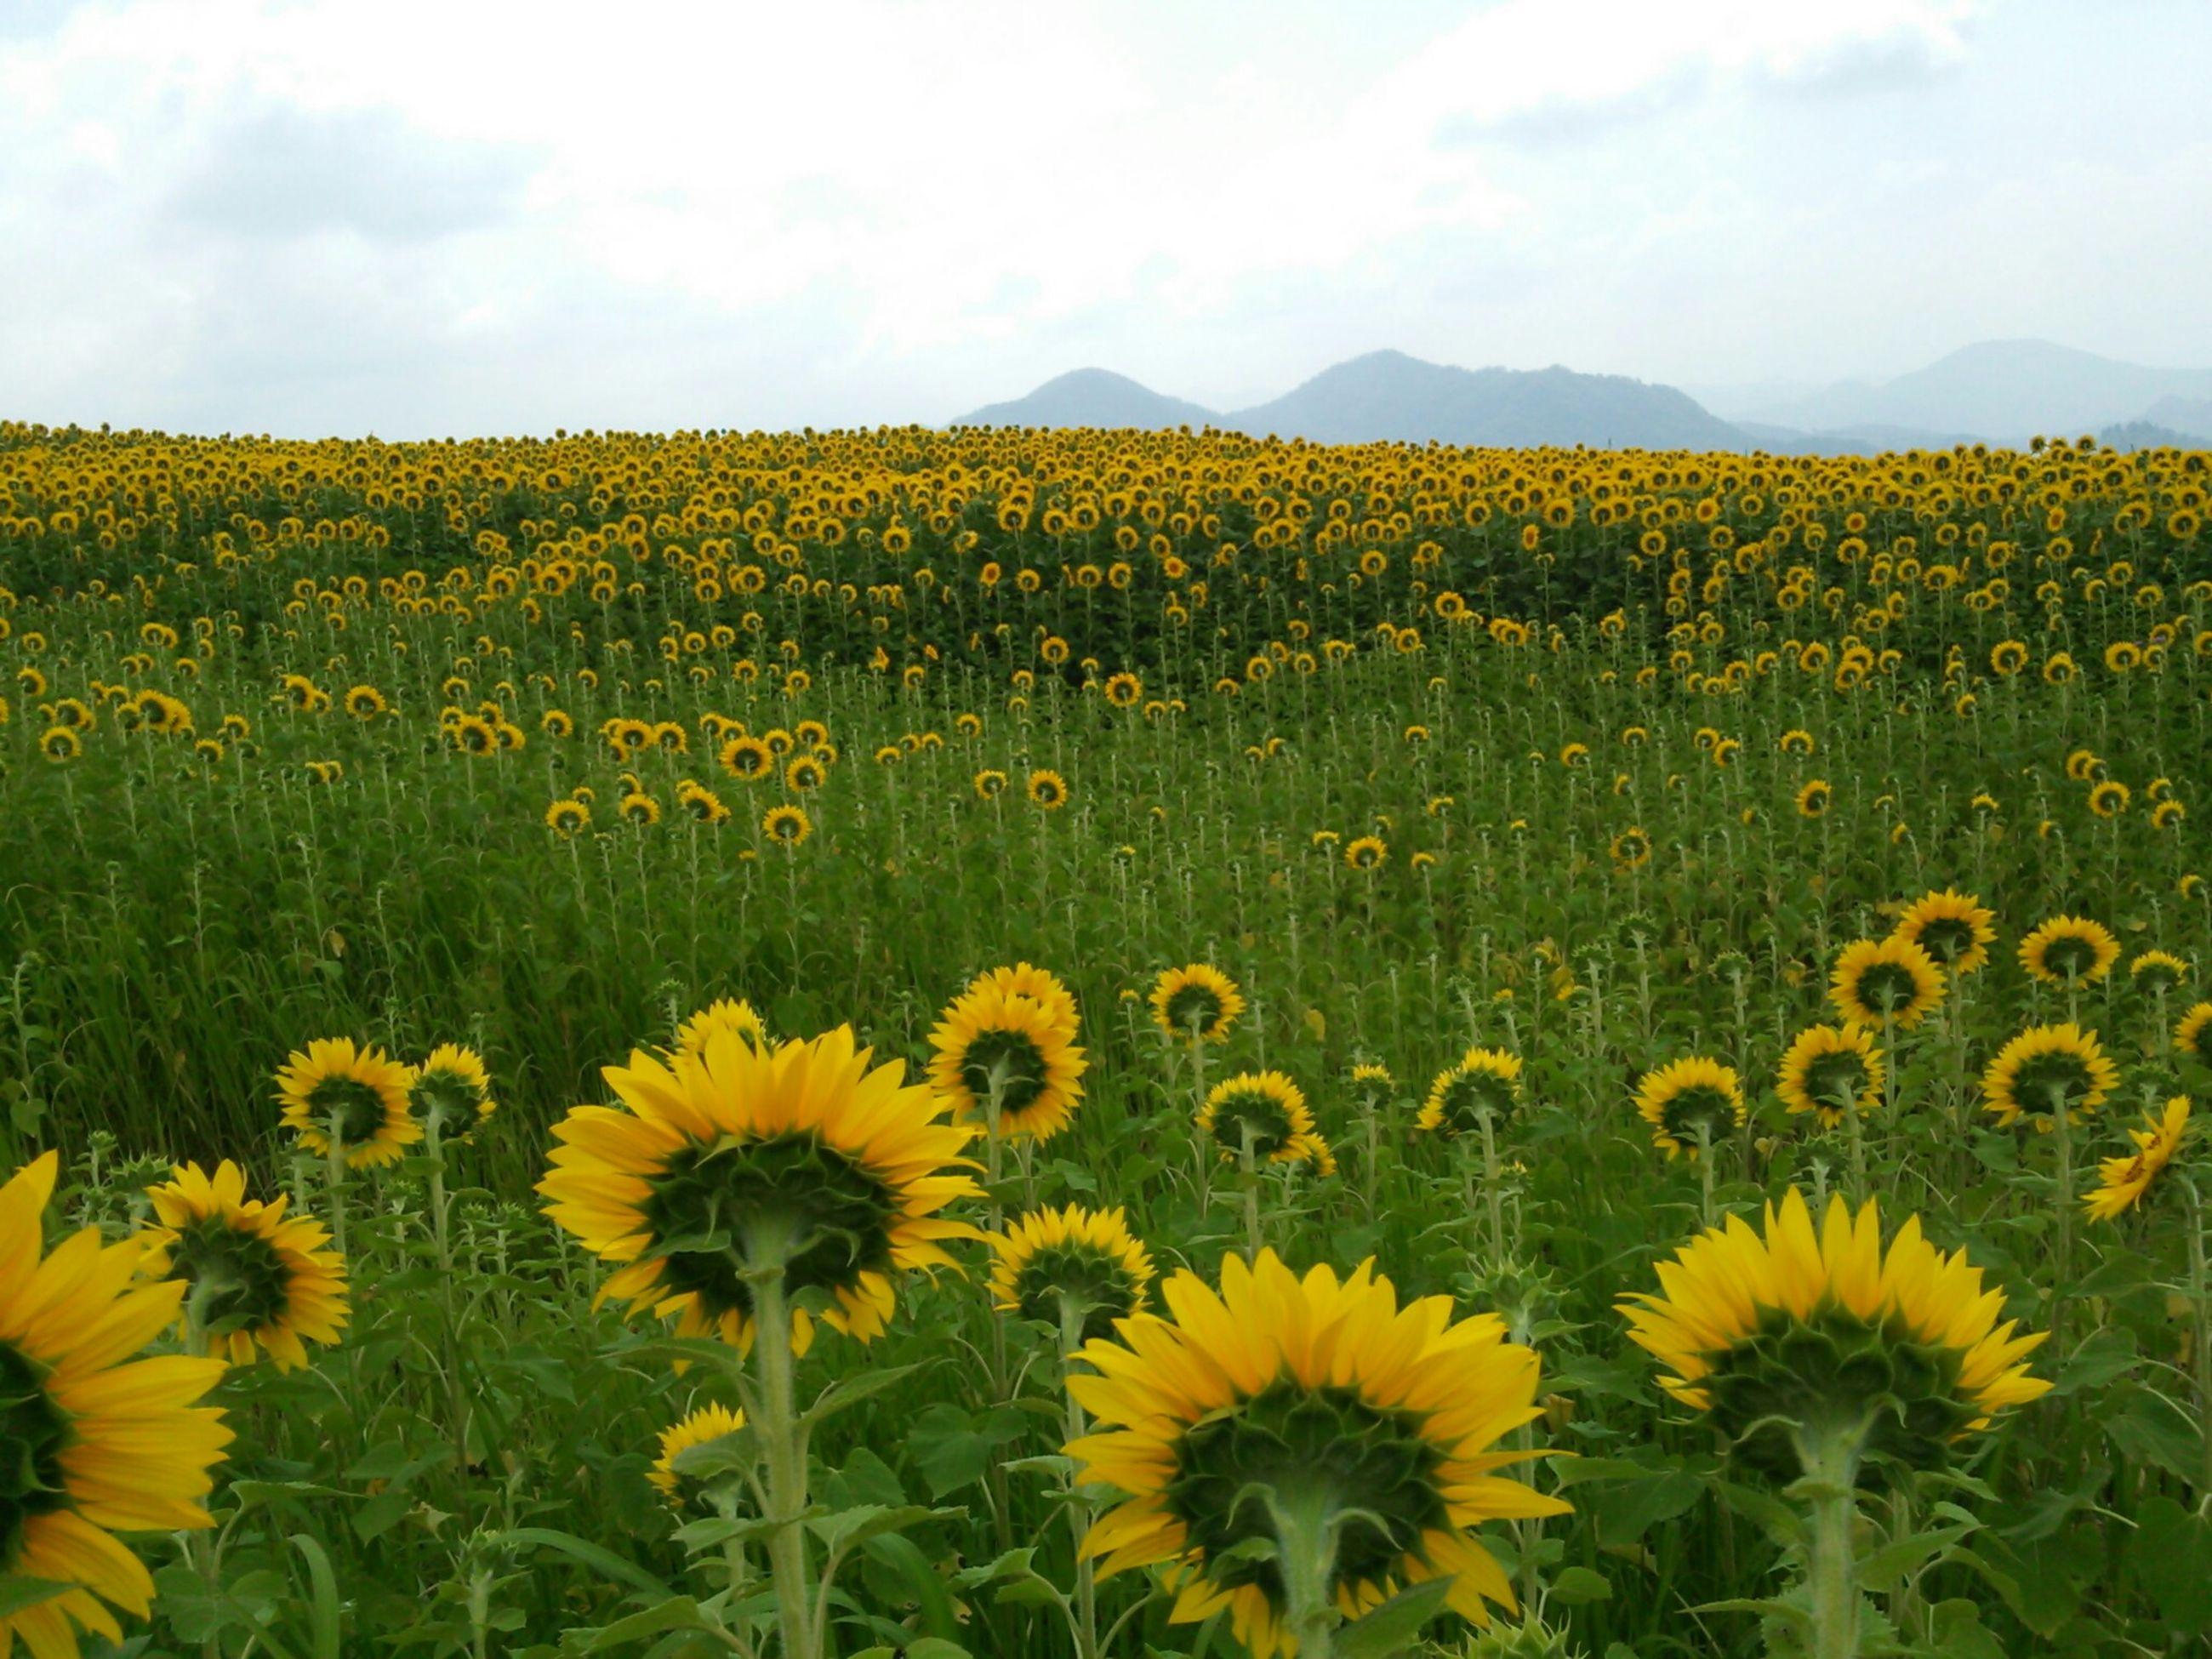 flower, yellow, freshness, growth, beauty in nature, field, fragility, rural scene, agriculture, sunflower, nature, landscape, plant, blooming, flower head, oilseed rape, petal, sky, farm, abundance